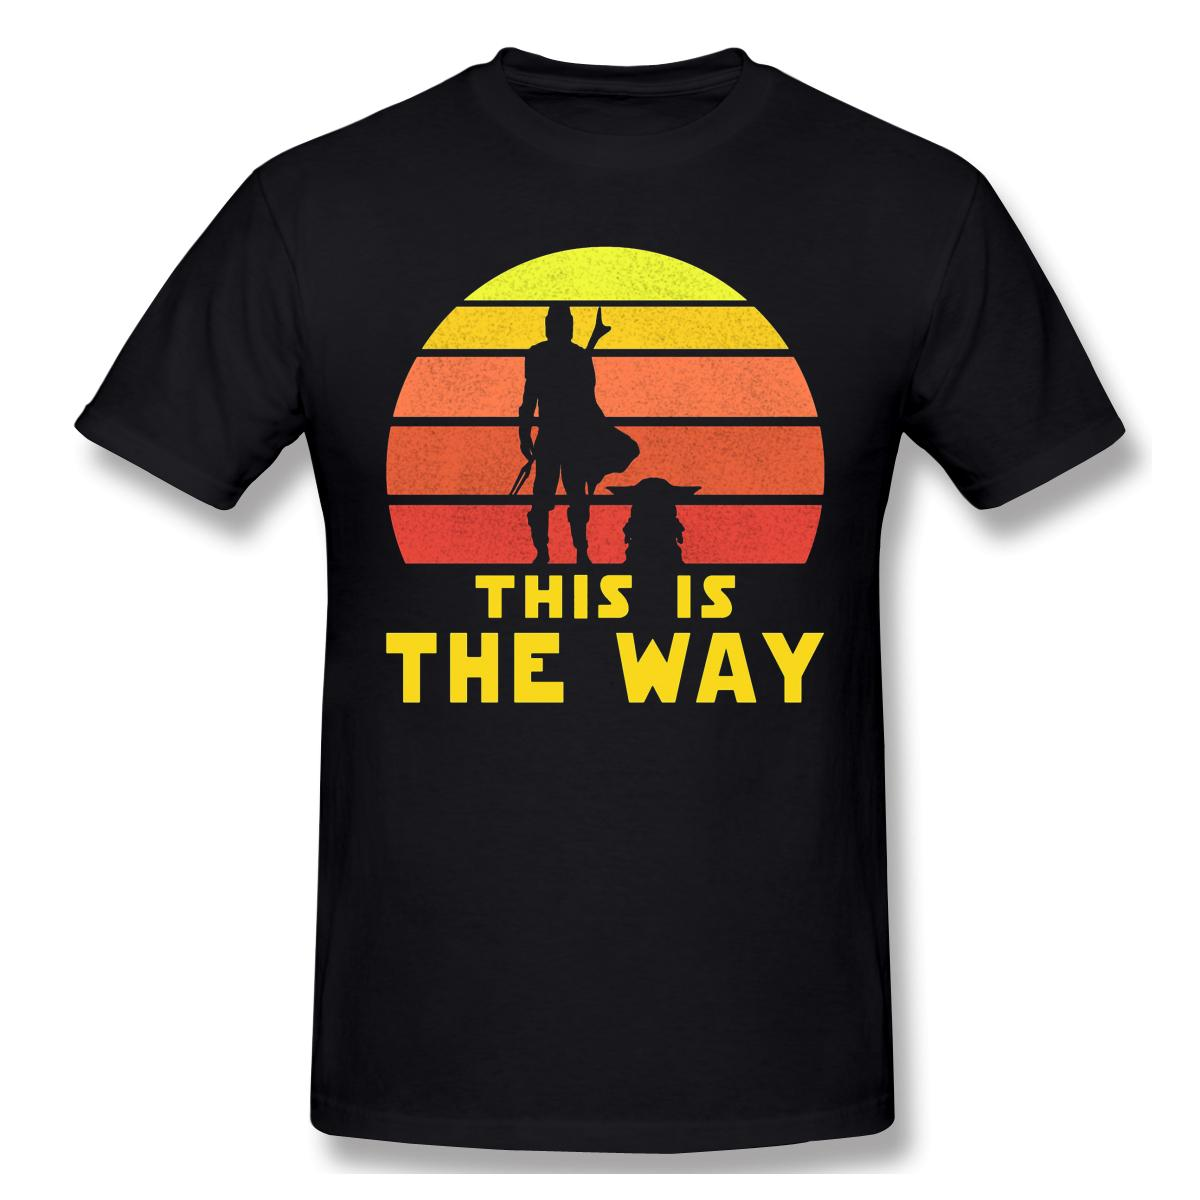 2020 Yeni Geliş Mando Retro Vol.1 Slim Fit Büyük satışı Tshirt% 100 Pamuk Jedi Fett Yetişkin Crewneck Tshirt Yuvarlak Yaka ofertas